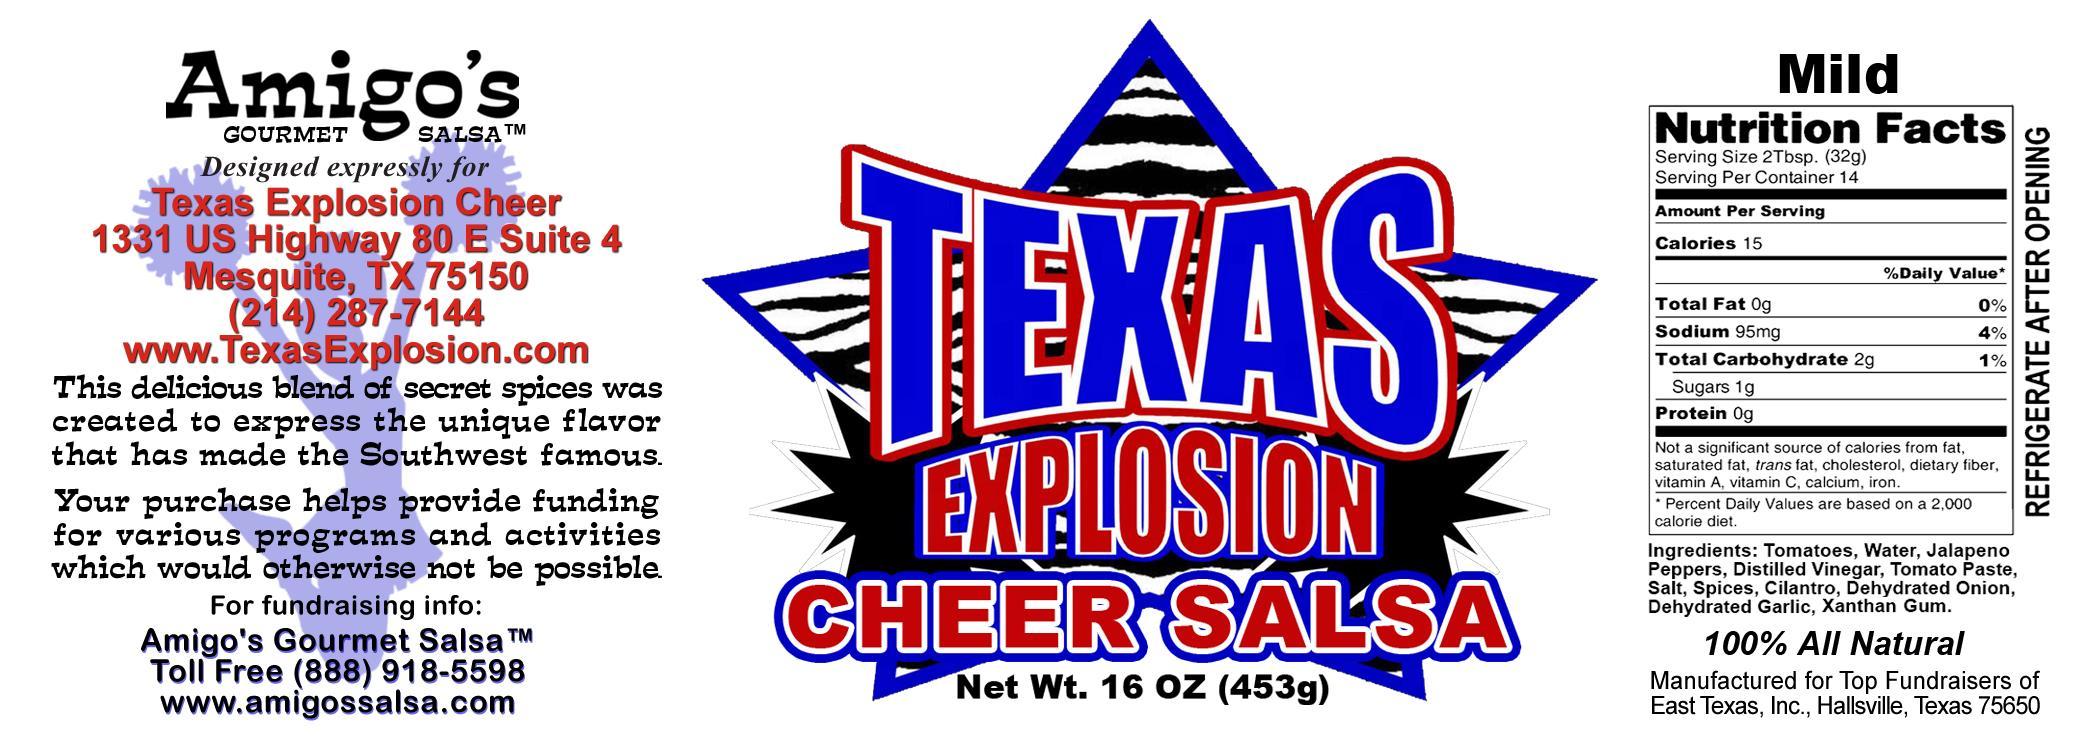 07 Texas Explosion Mild.jpg